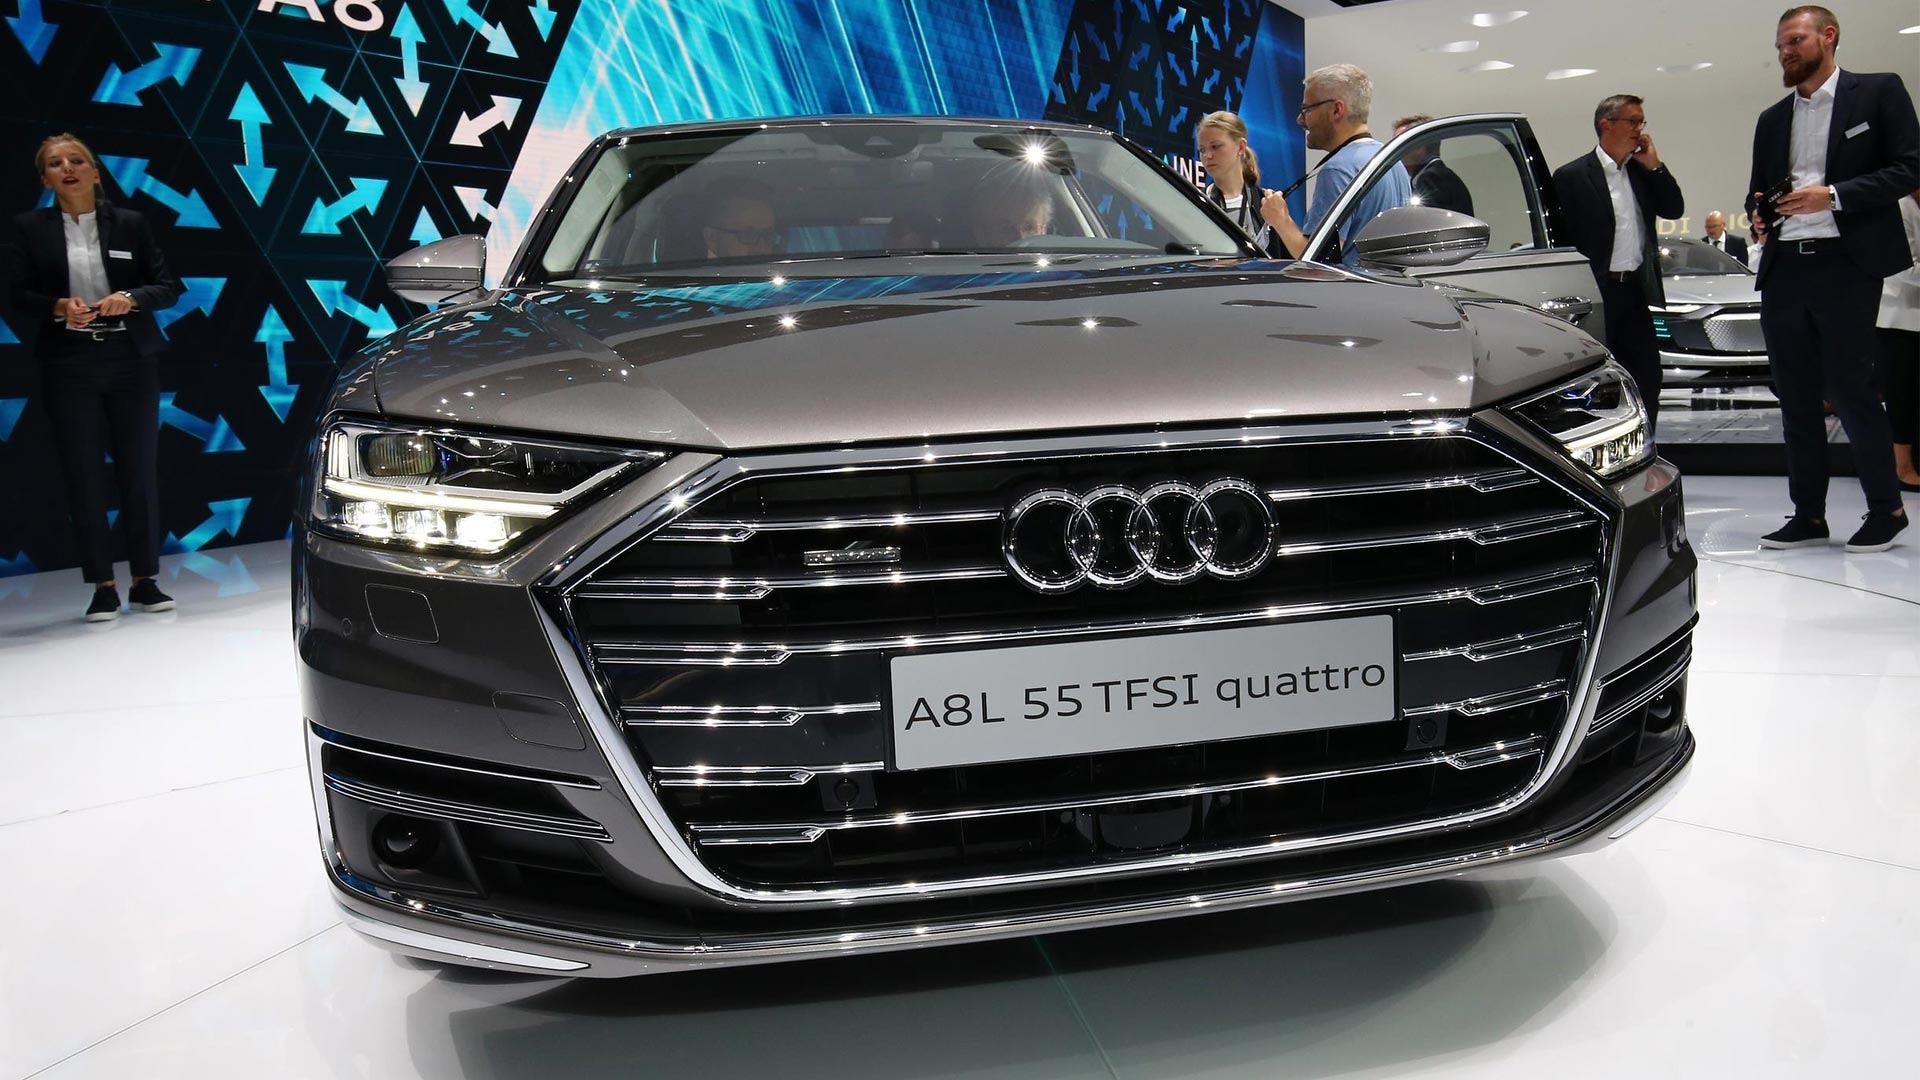 transmission coupe manual super india quatrro cars mumbai forum imports price fsi audi